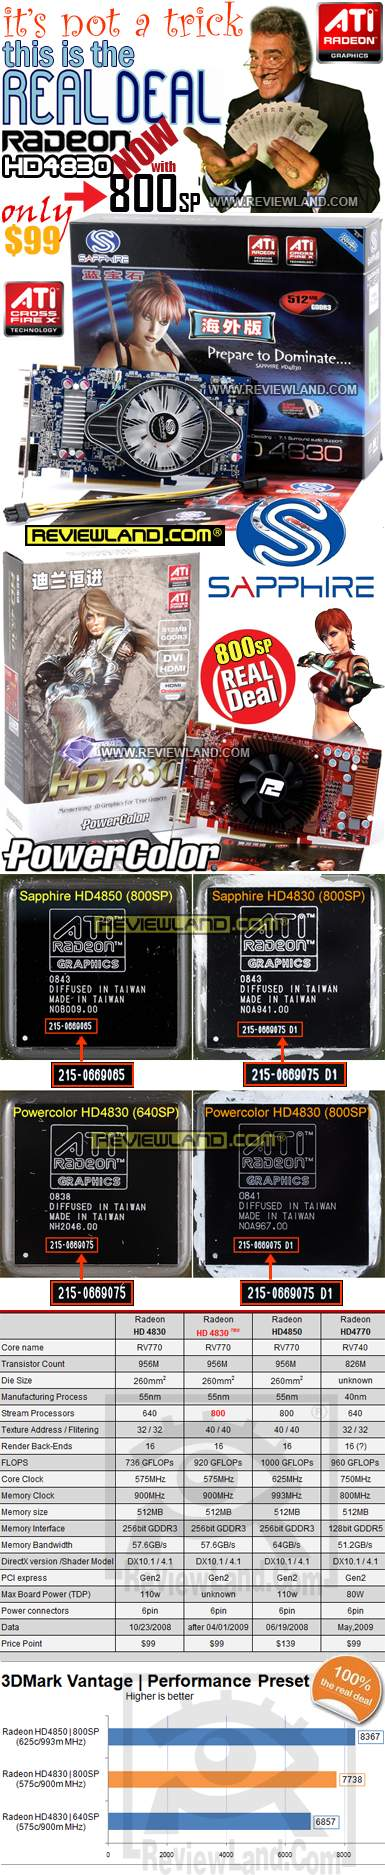 090430-radeon4830new800sp.jpg (171396 bytes)